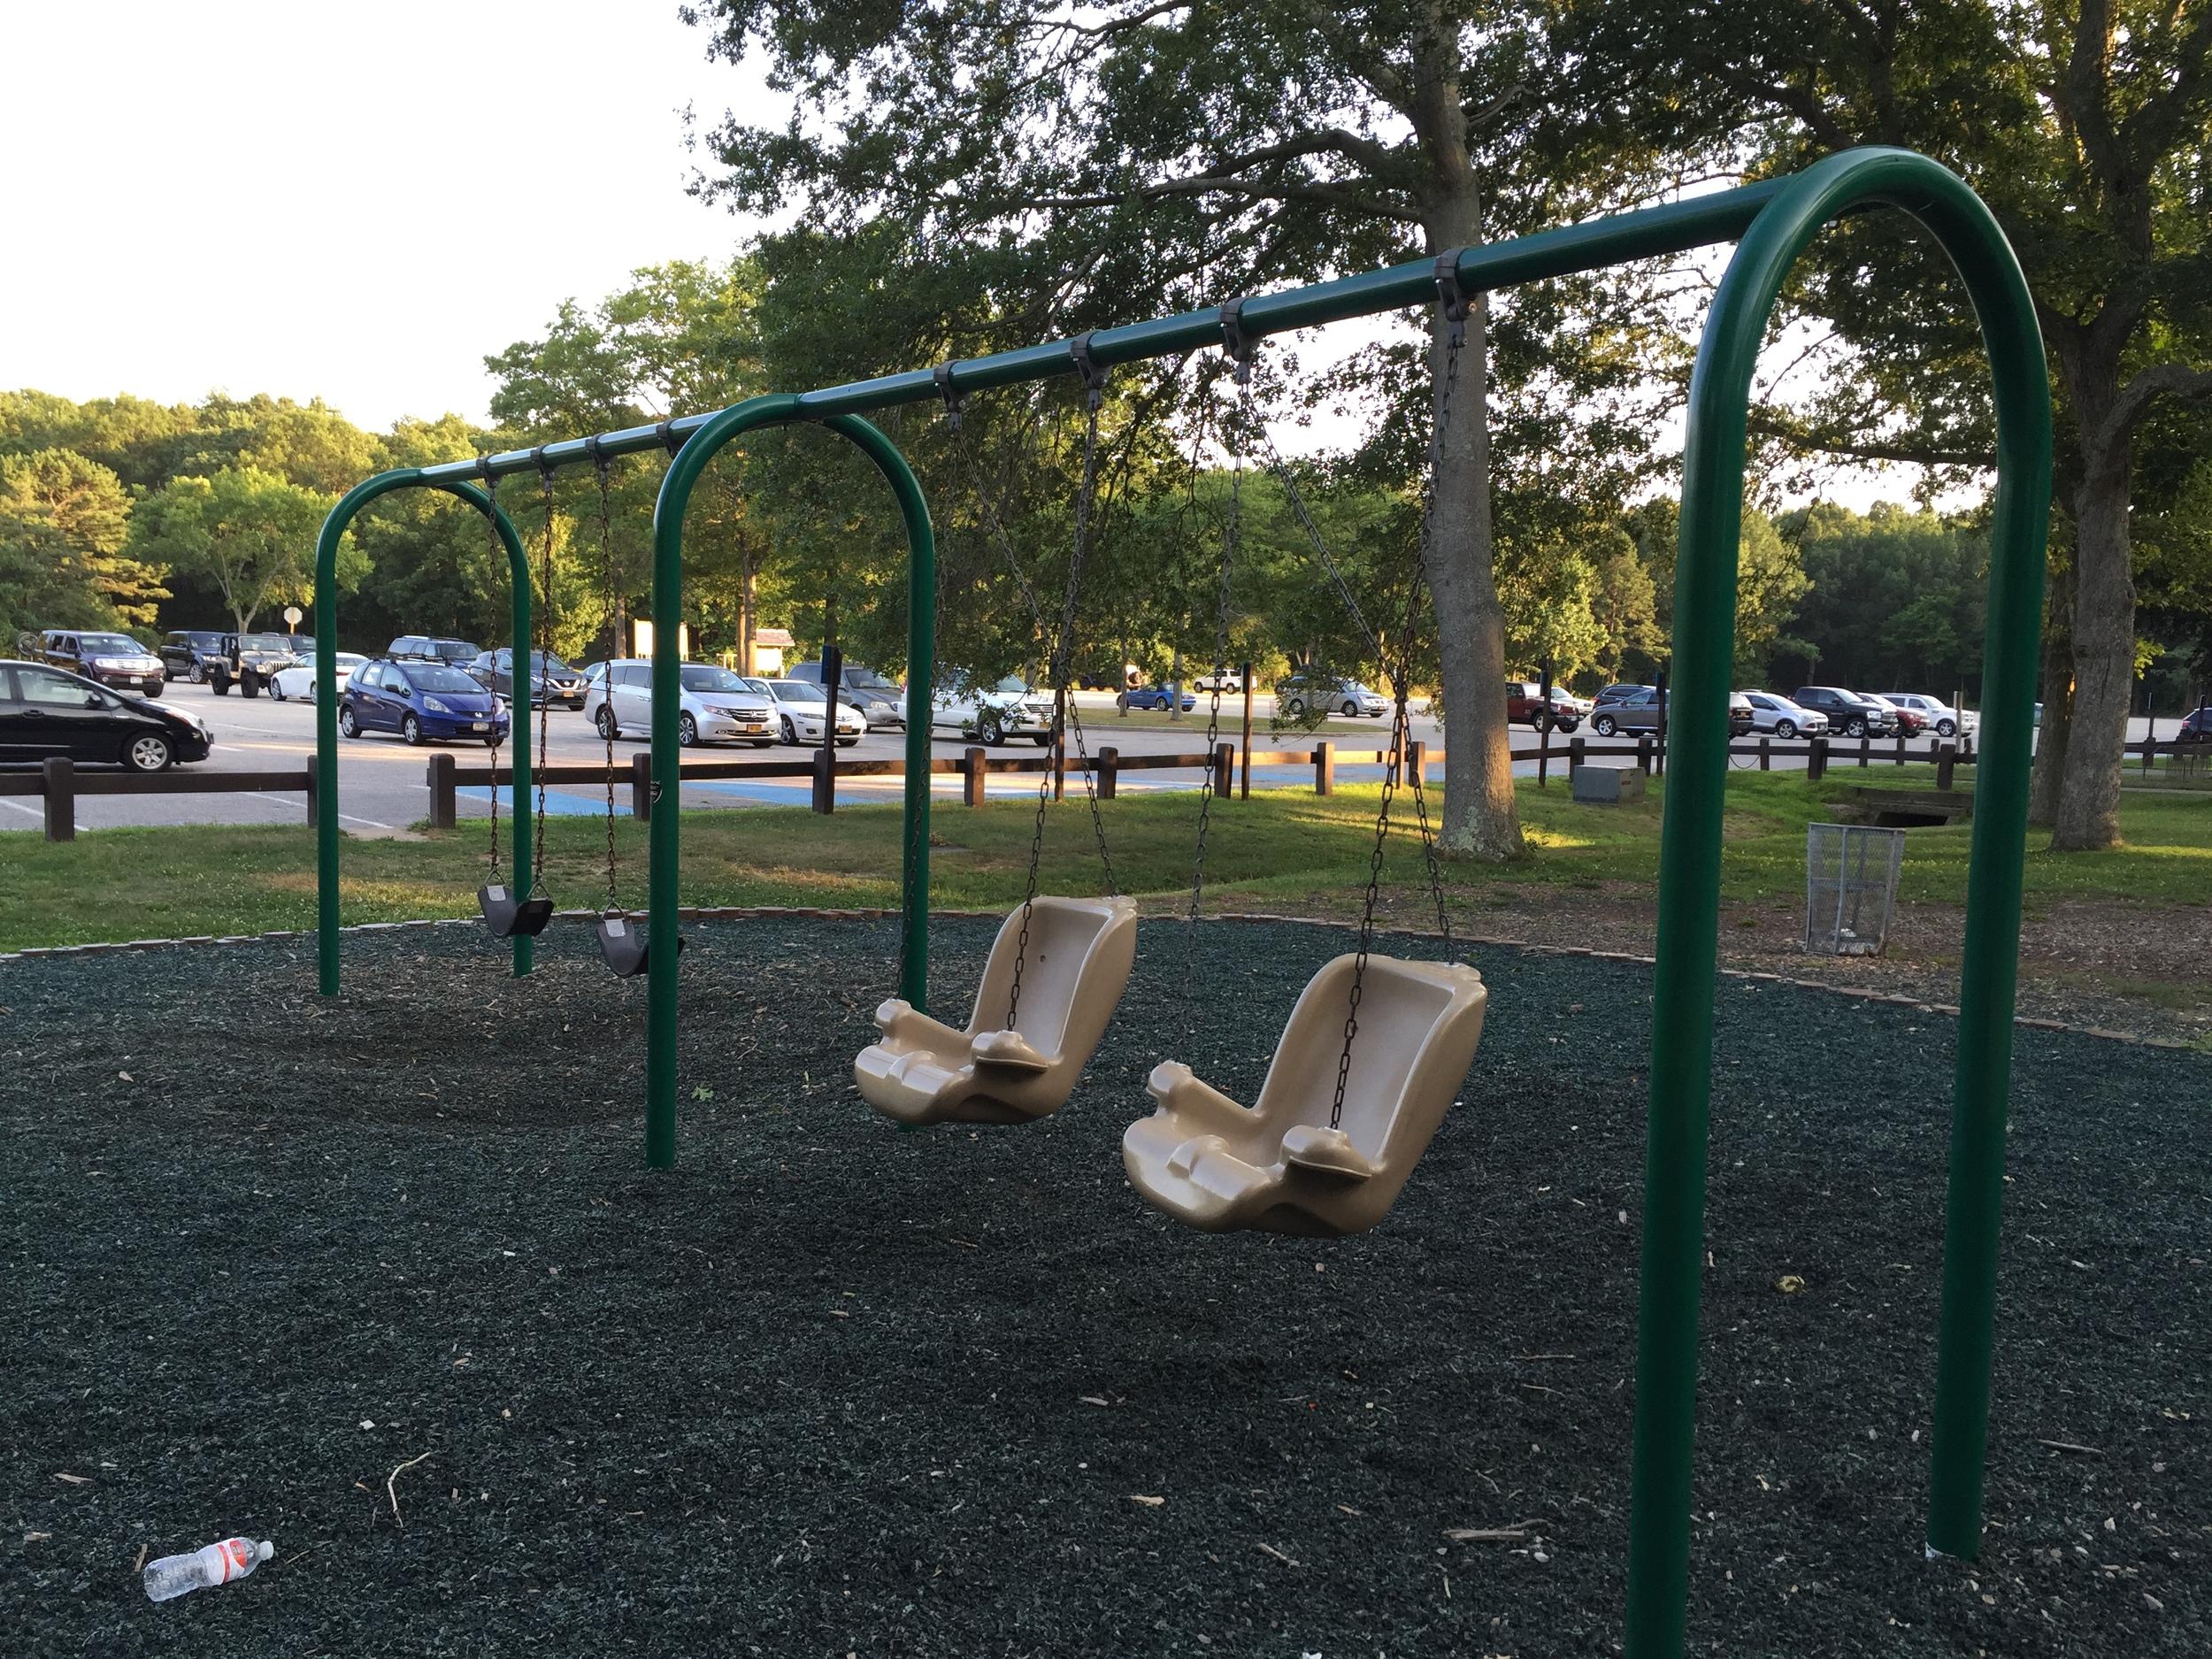 Big kid swings at Bethpage State Park